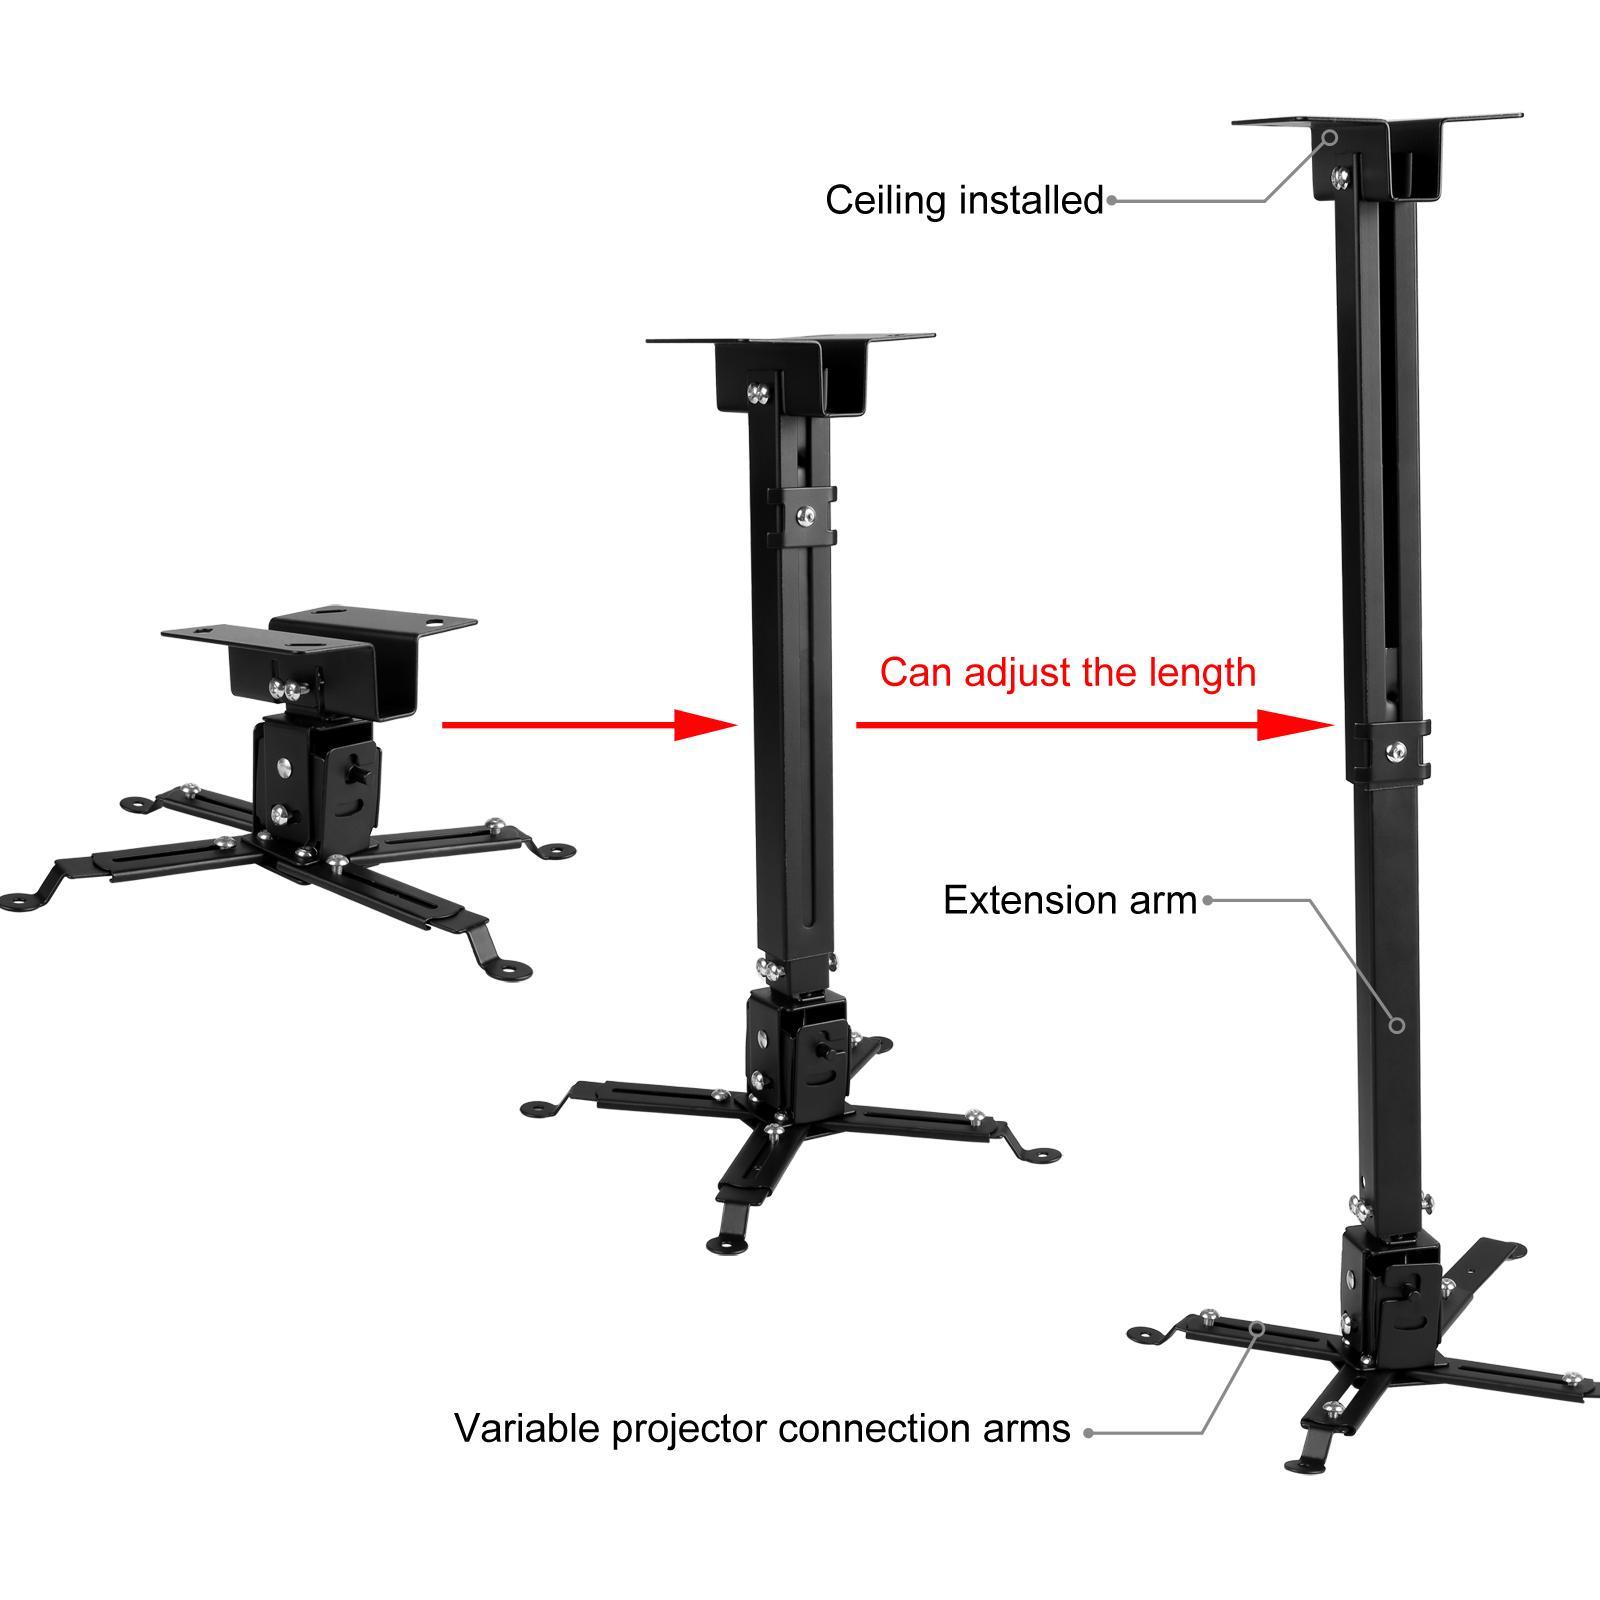 Universal Projector Ceiling Wall Mount Rack Bracket LCD DLP Tilt 44lbs Extendable Black 0